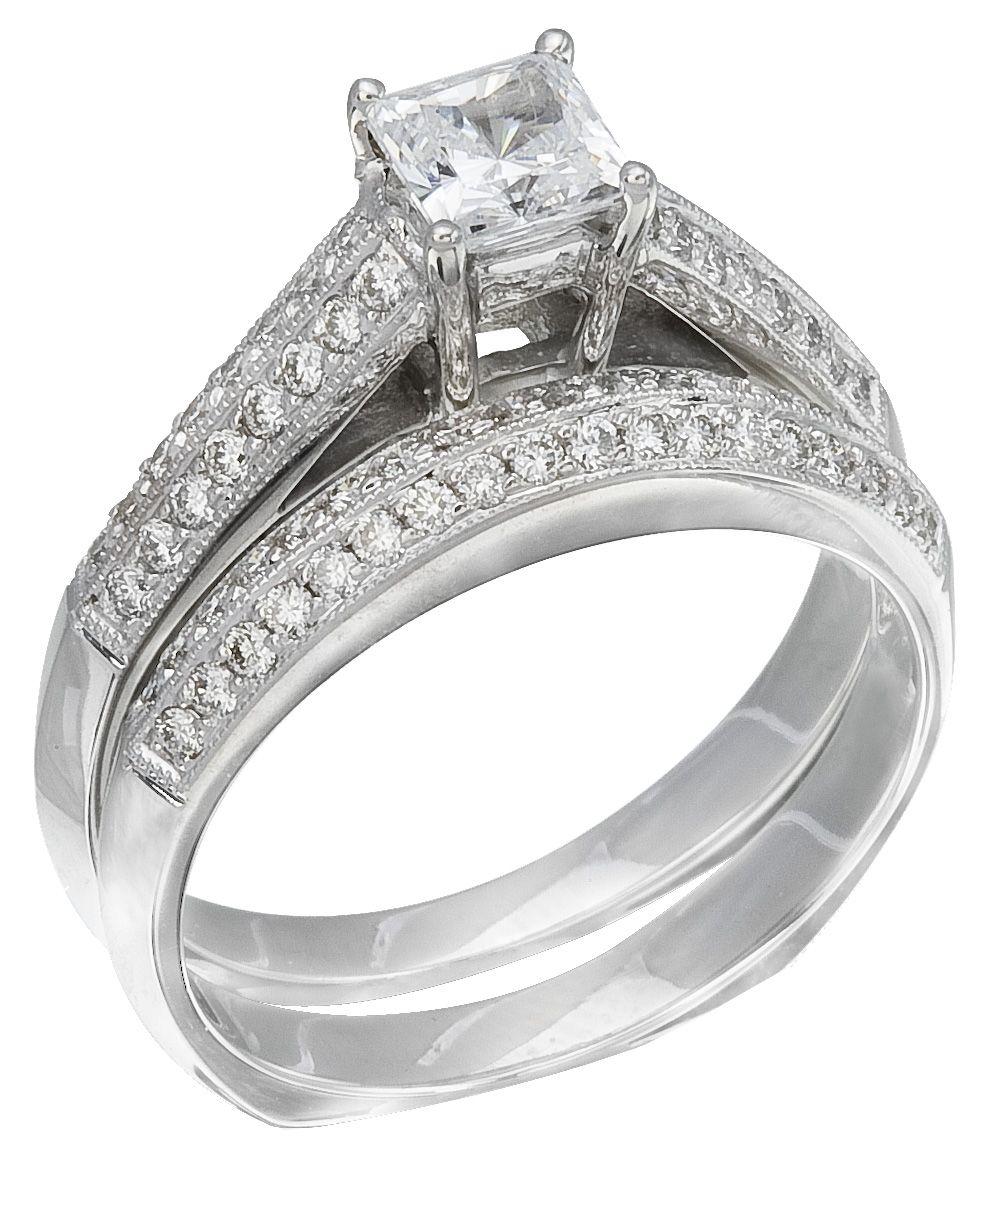 Iamond Wedding Ring Set 46 Carat Diamonds On 14K White Gold